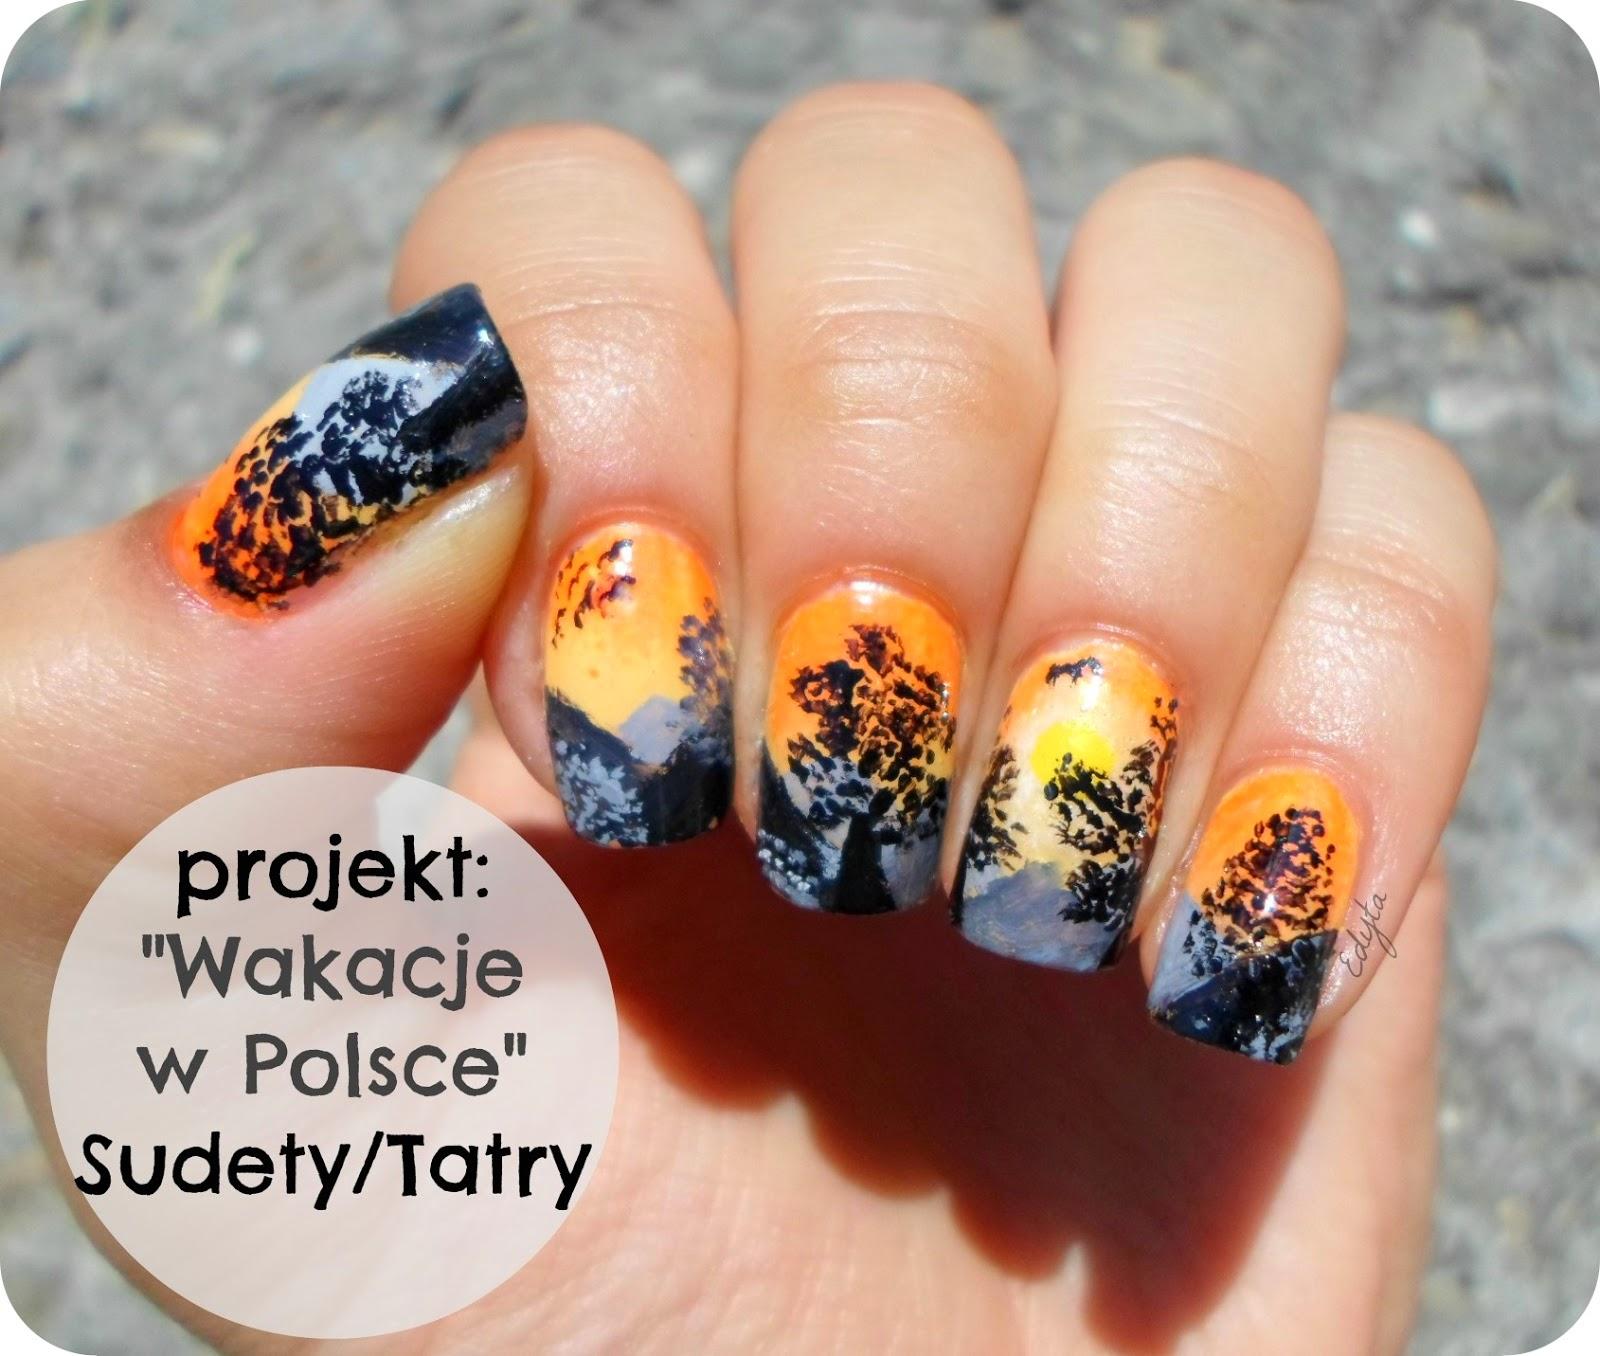 http://nailsandmore2.blogspot.com/2014/07/wakacje-w-polsce-sudetytatry.html